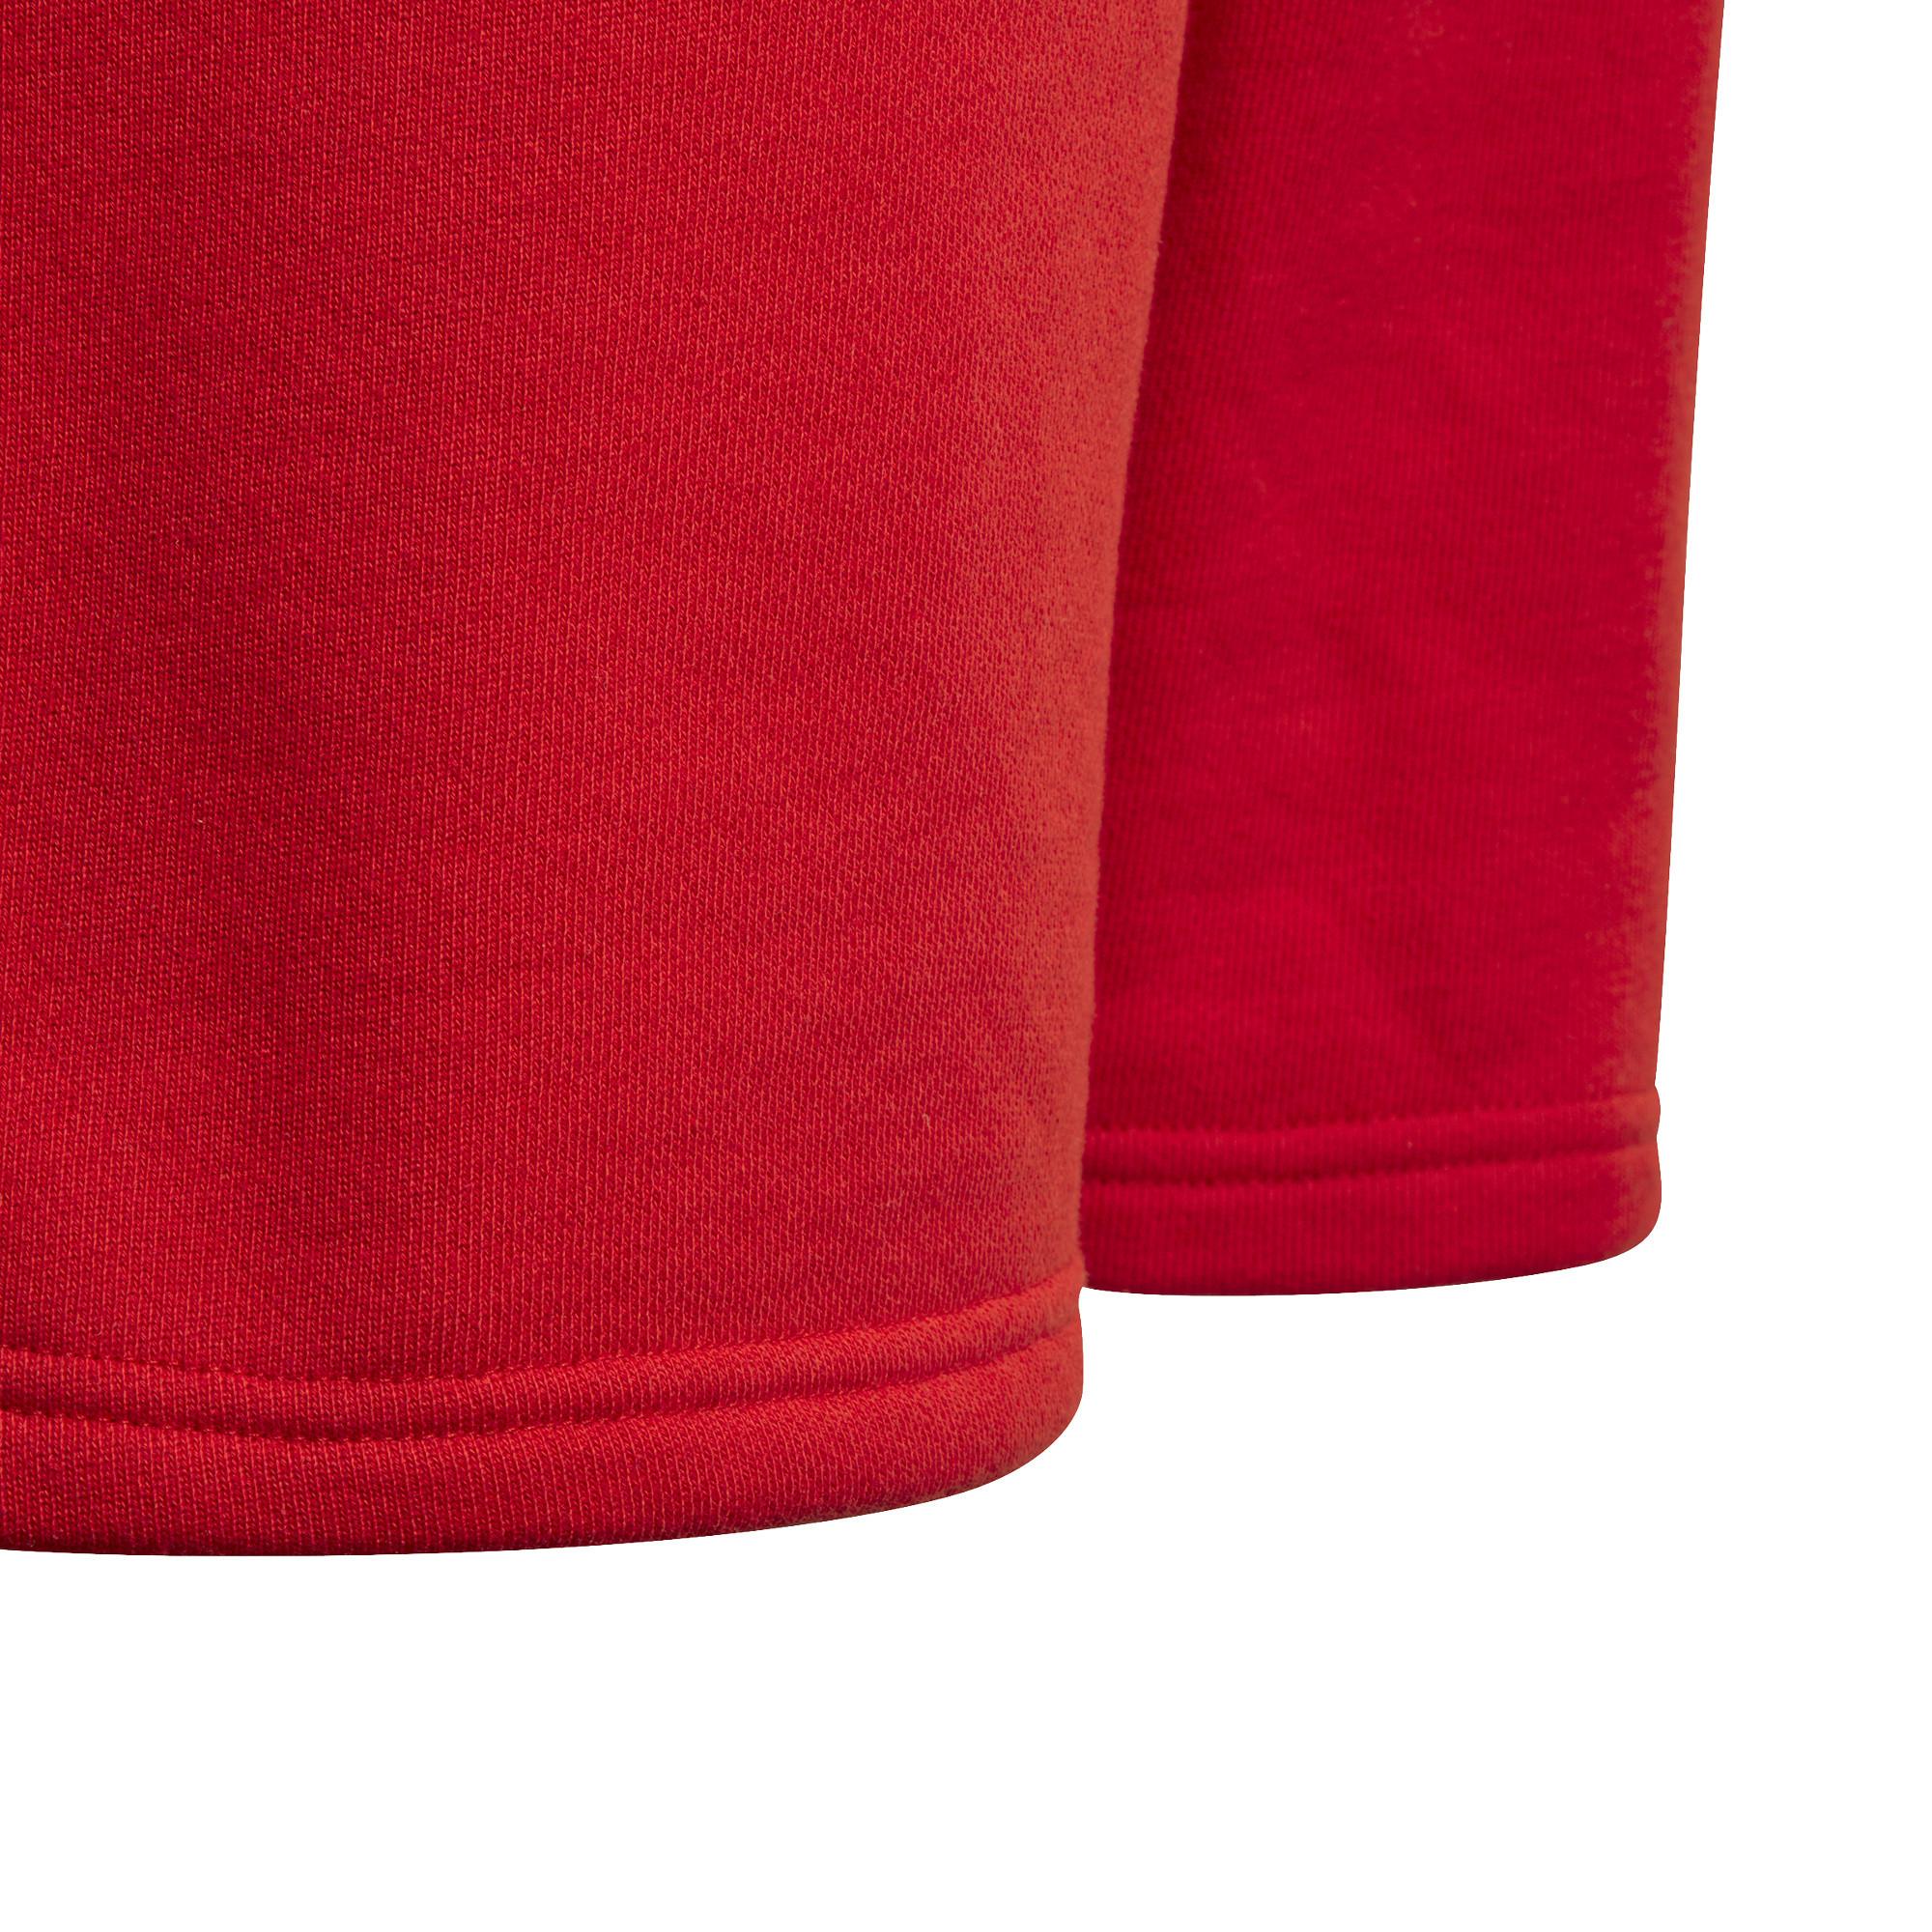 Short loungewear trefoil Essentials, Rosso, large image number 10